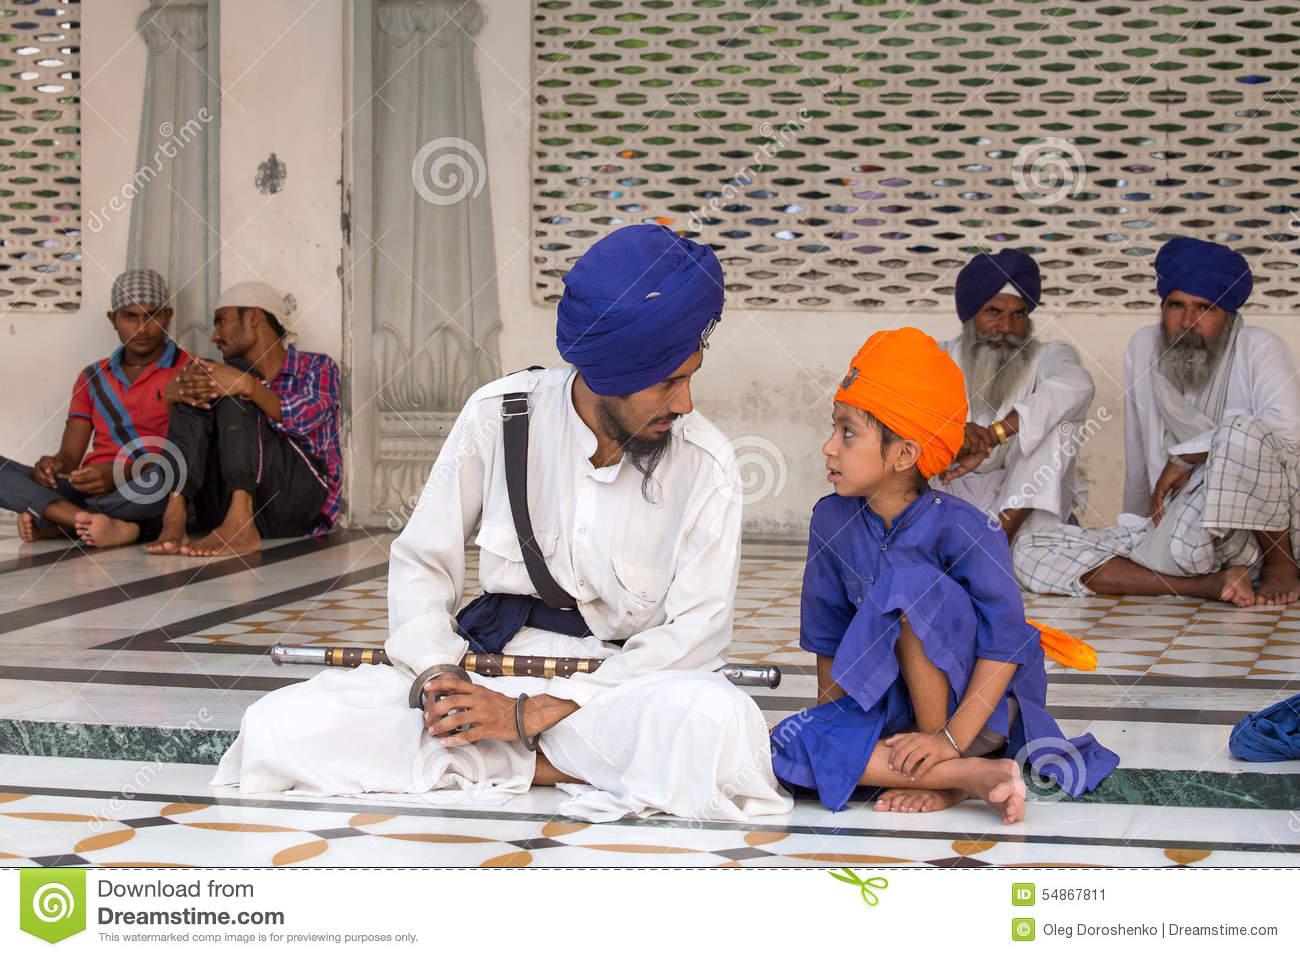 sikh-man-boy-visiting-golden-temple-amritsar-punjab-india-september-unidentified-pilgrims-travel-54867811[1]